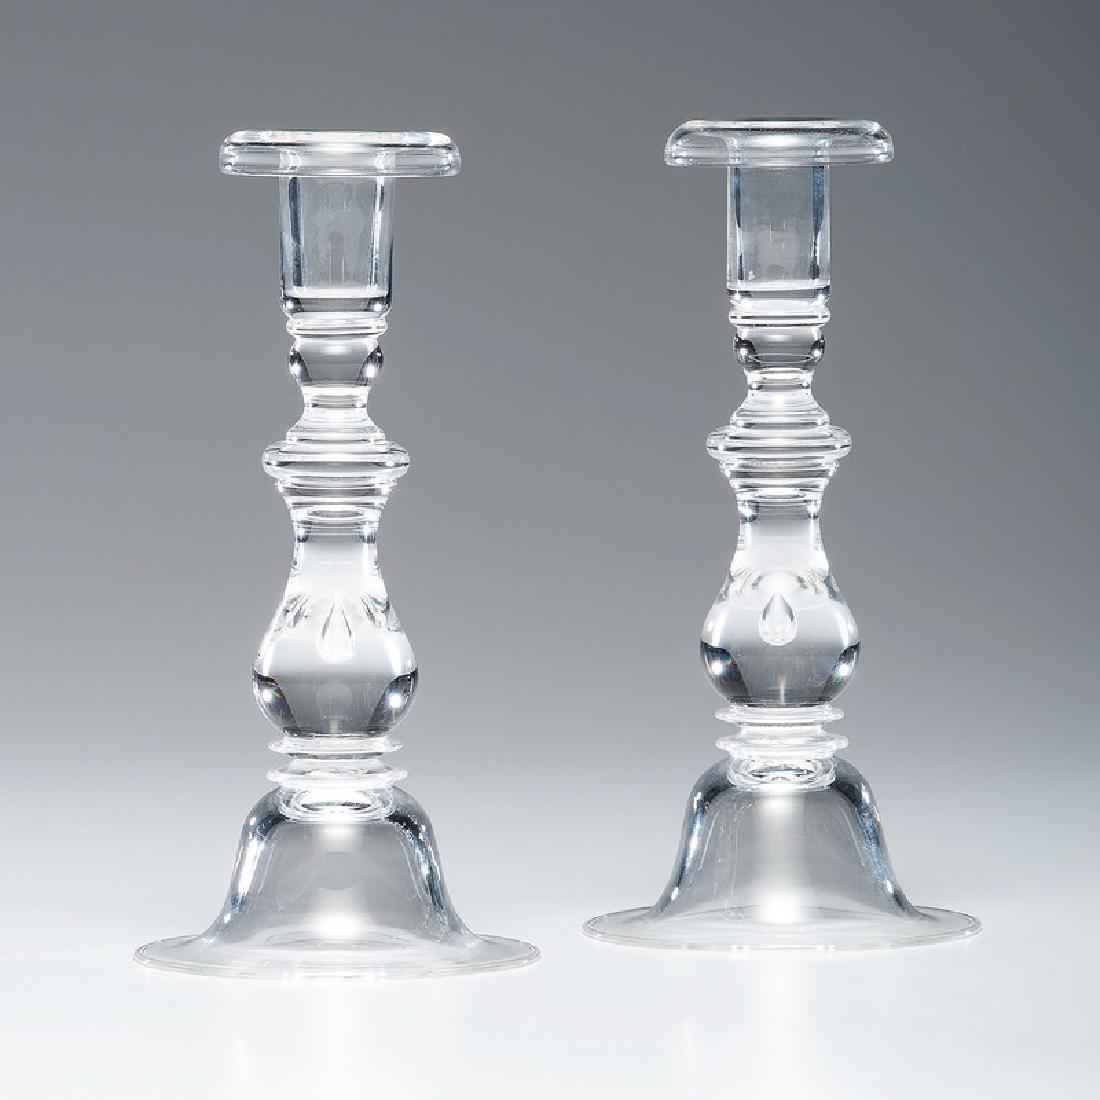 Steuben Crystal Teardrop Candlesticks